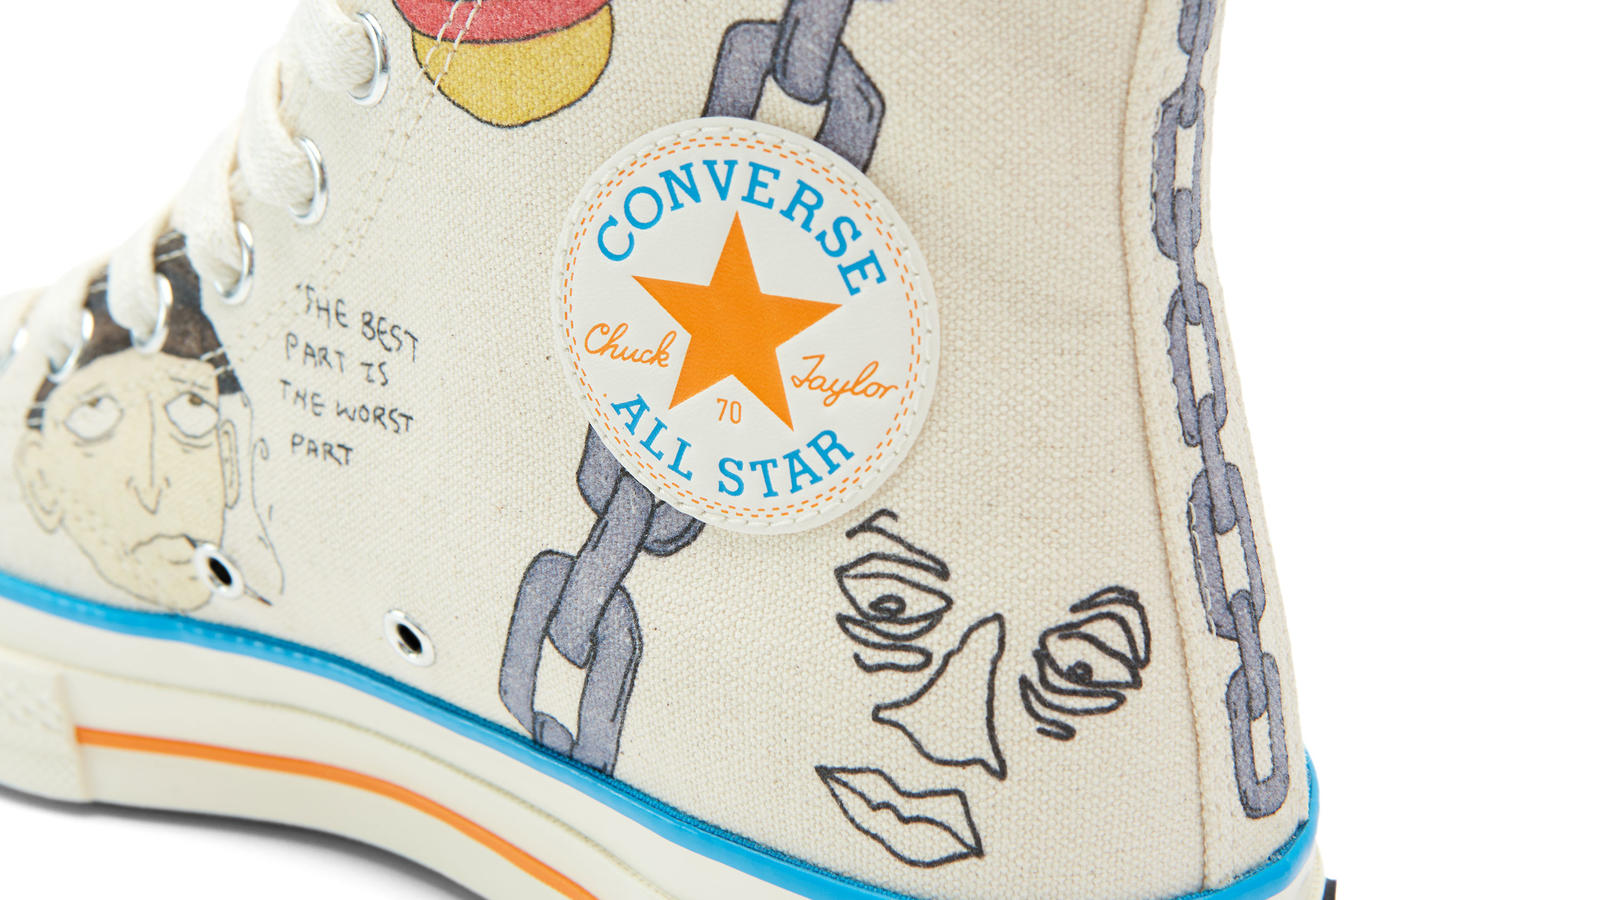 Converse Artist Series Foot Locker